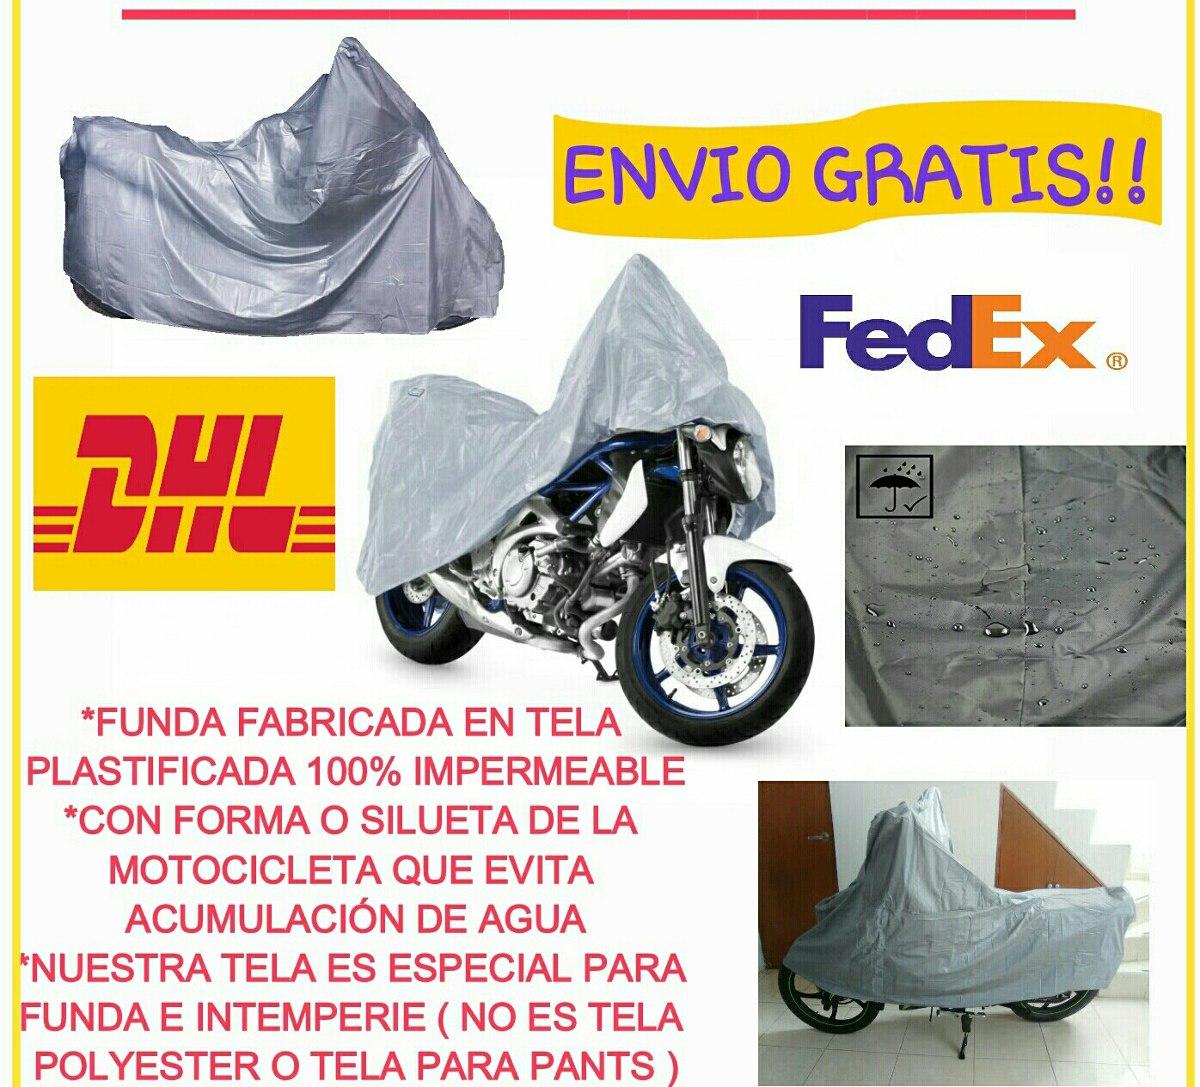 644b413d921 Funda Xl Para Motocicleta Grande Choper Alforjas Respaldo - $ 399.00 ...